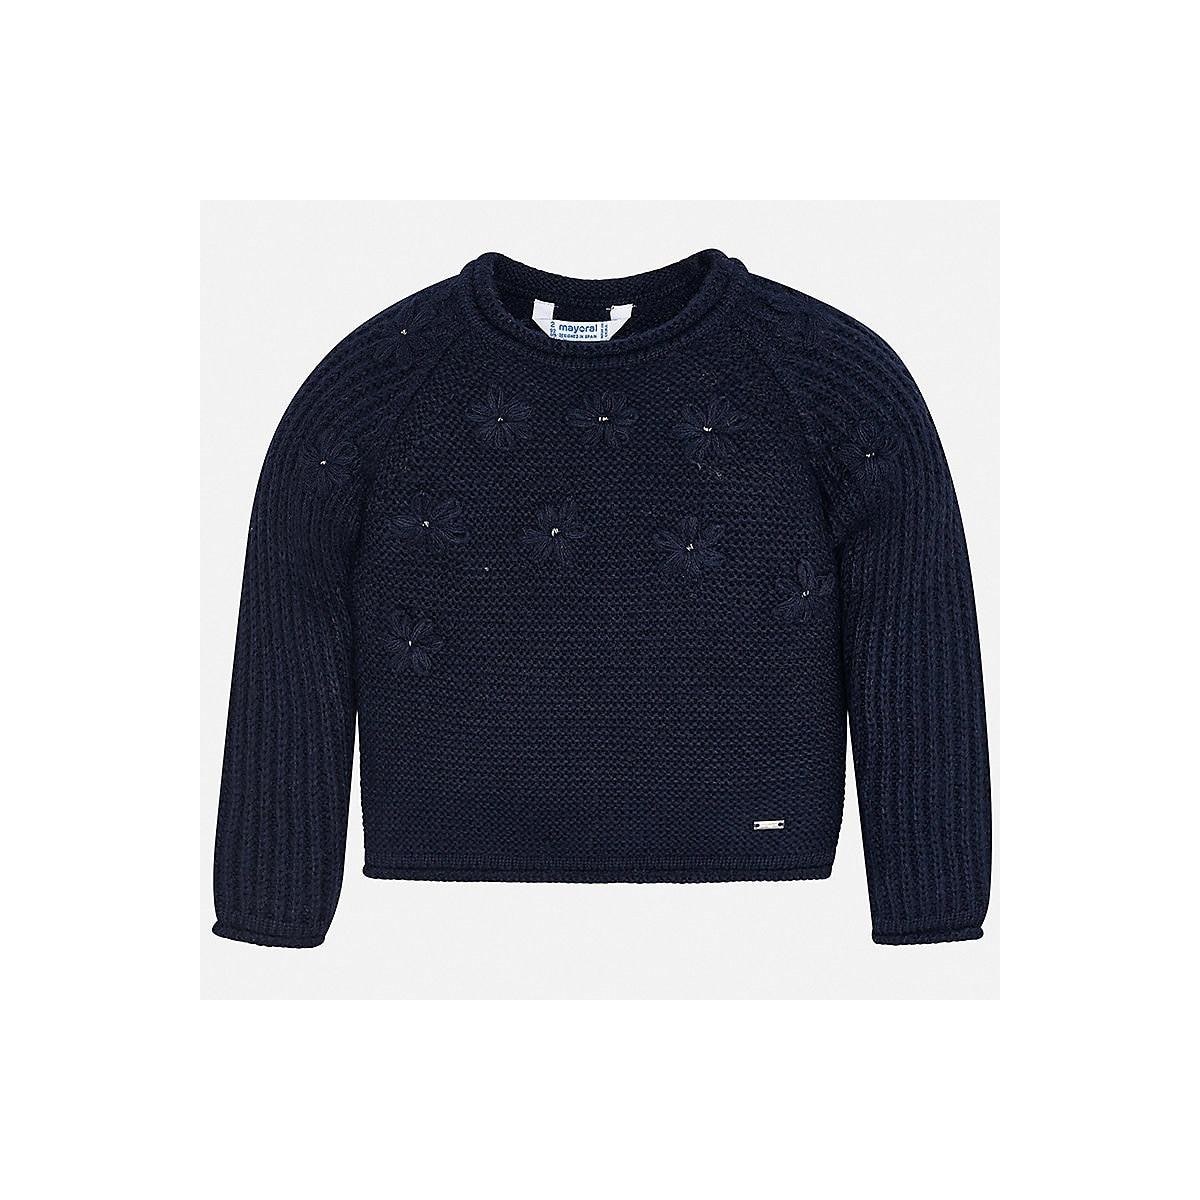 MAYORAL Sweaters 8848671 Girls Acrylic winter clothes baby wear boy children child wear